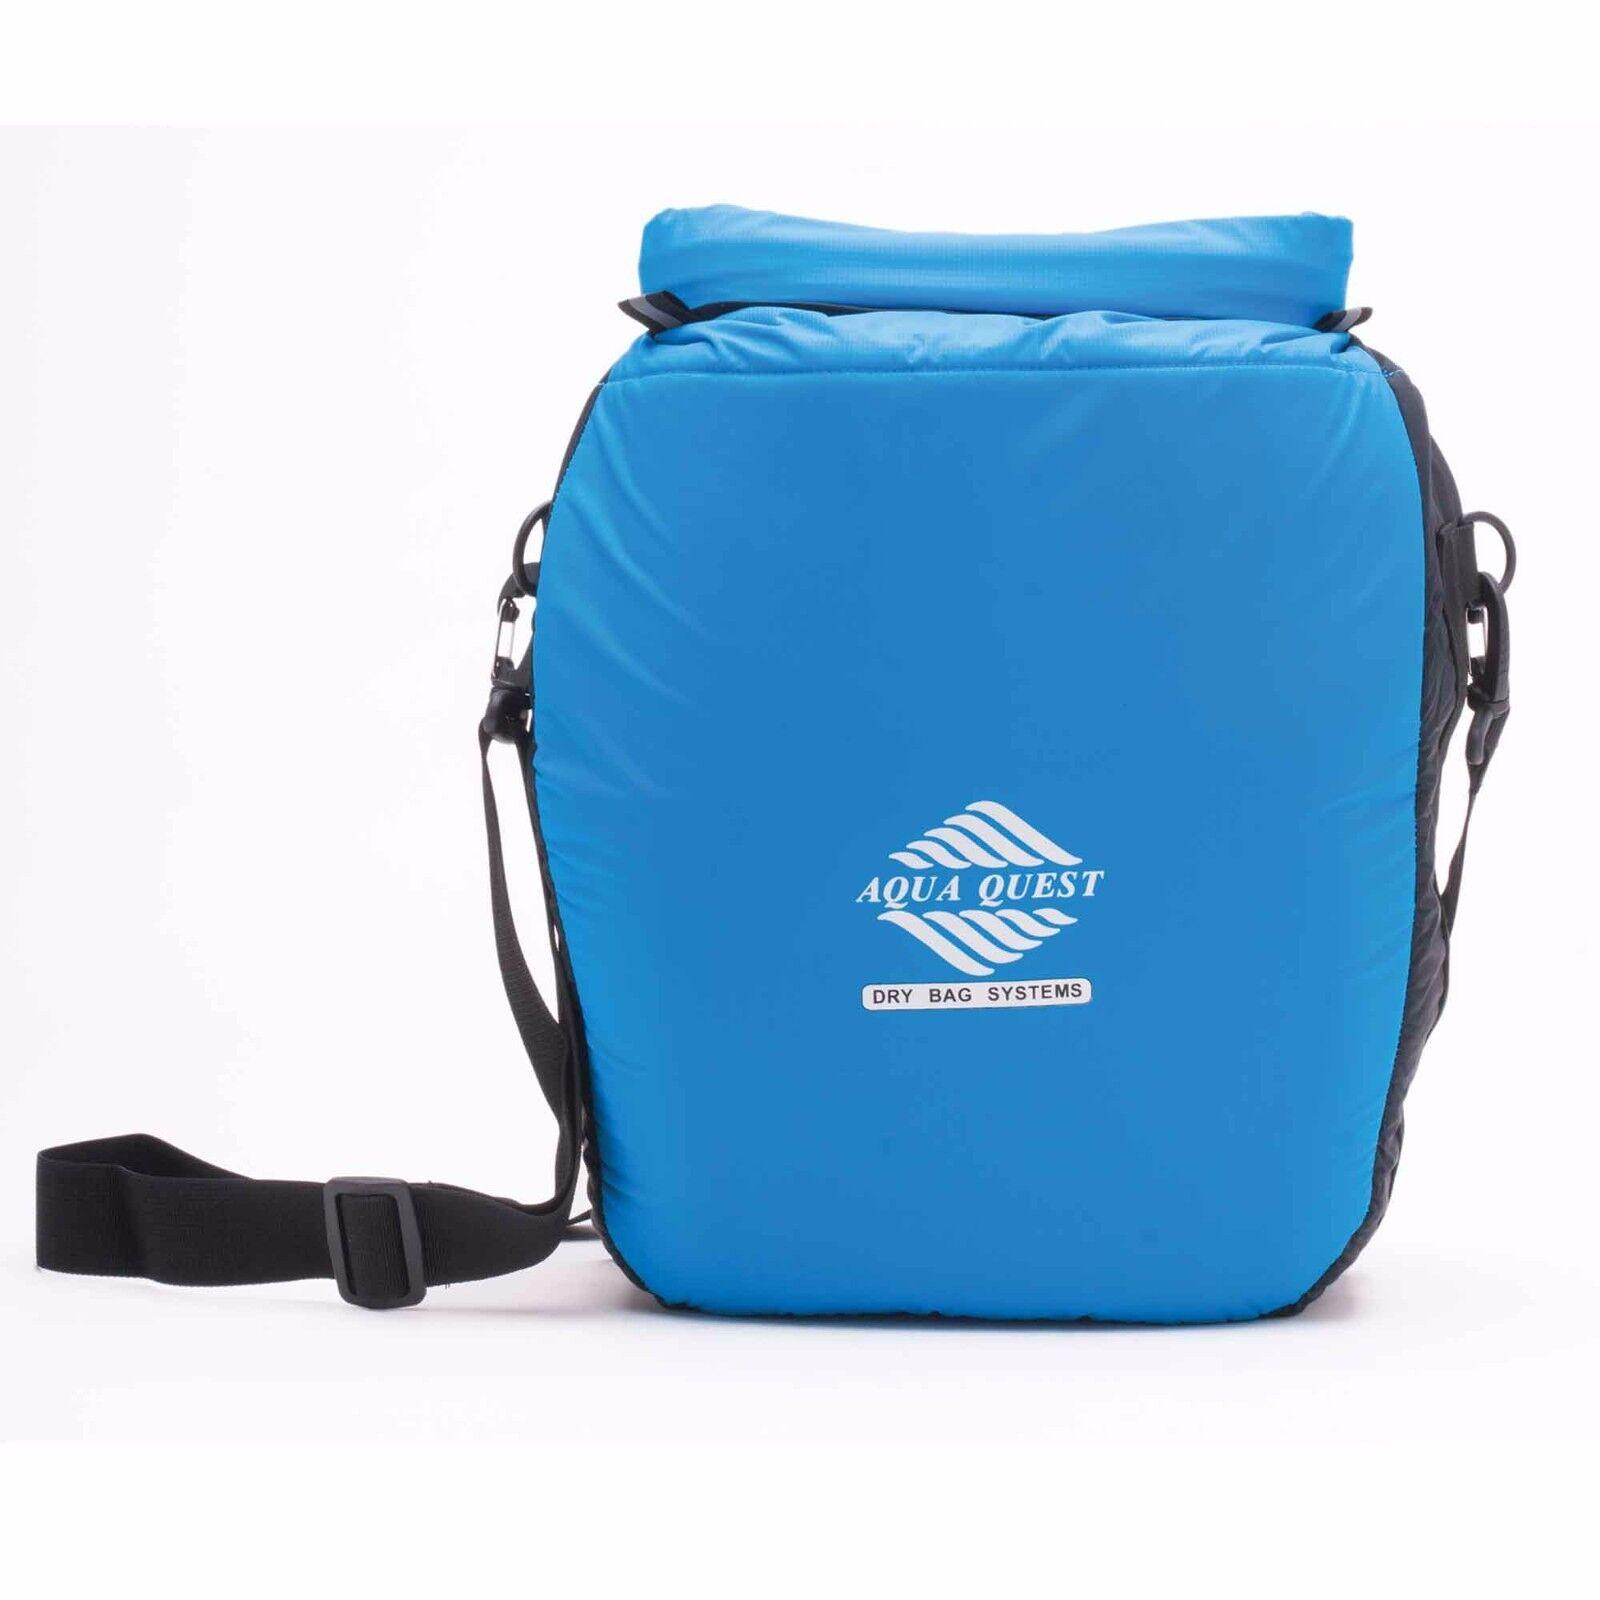 Aqua Quest Cool Cat - 100% Waterproof Cooler Bag - 12 L Padded & Thermal Dry Bag